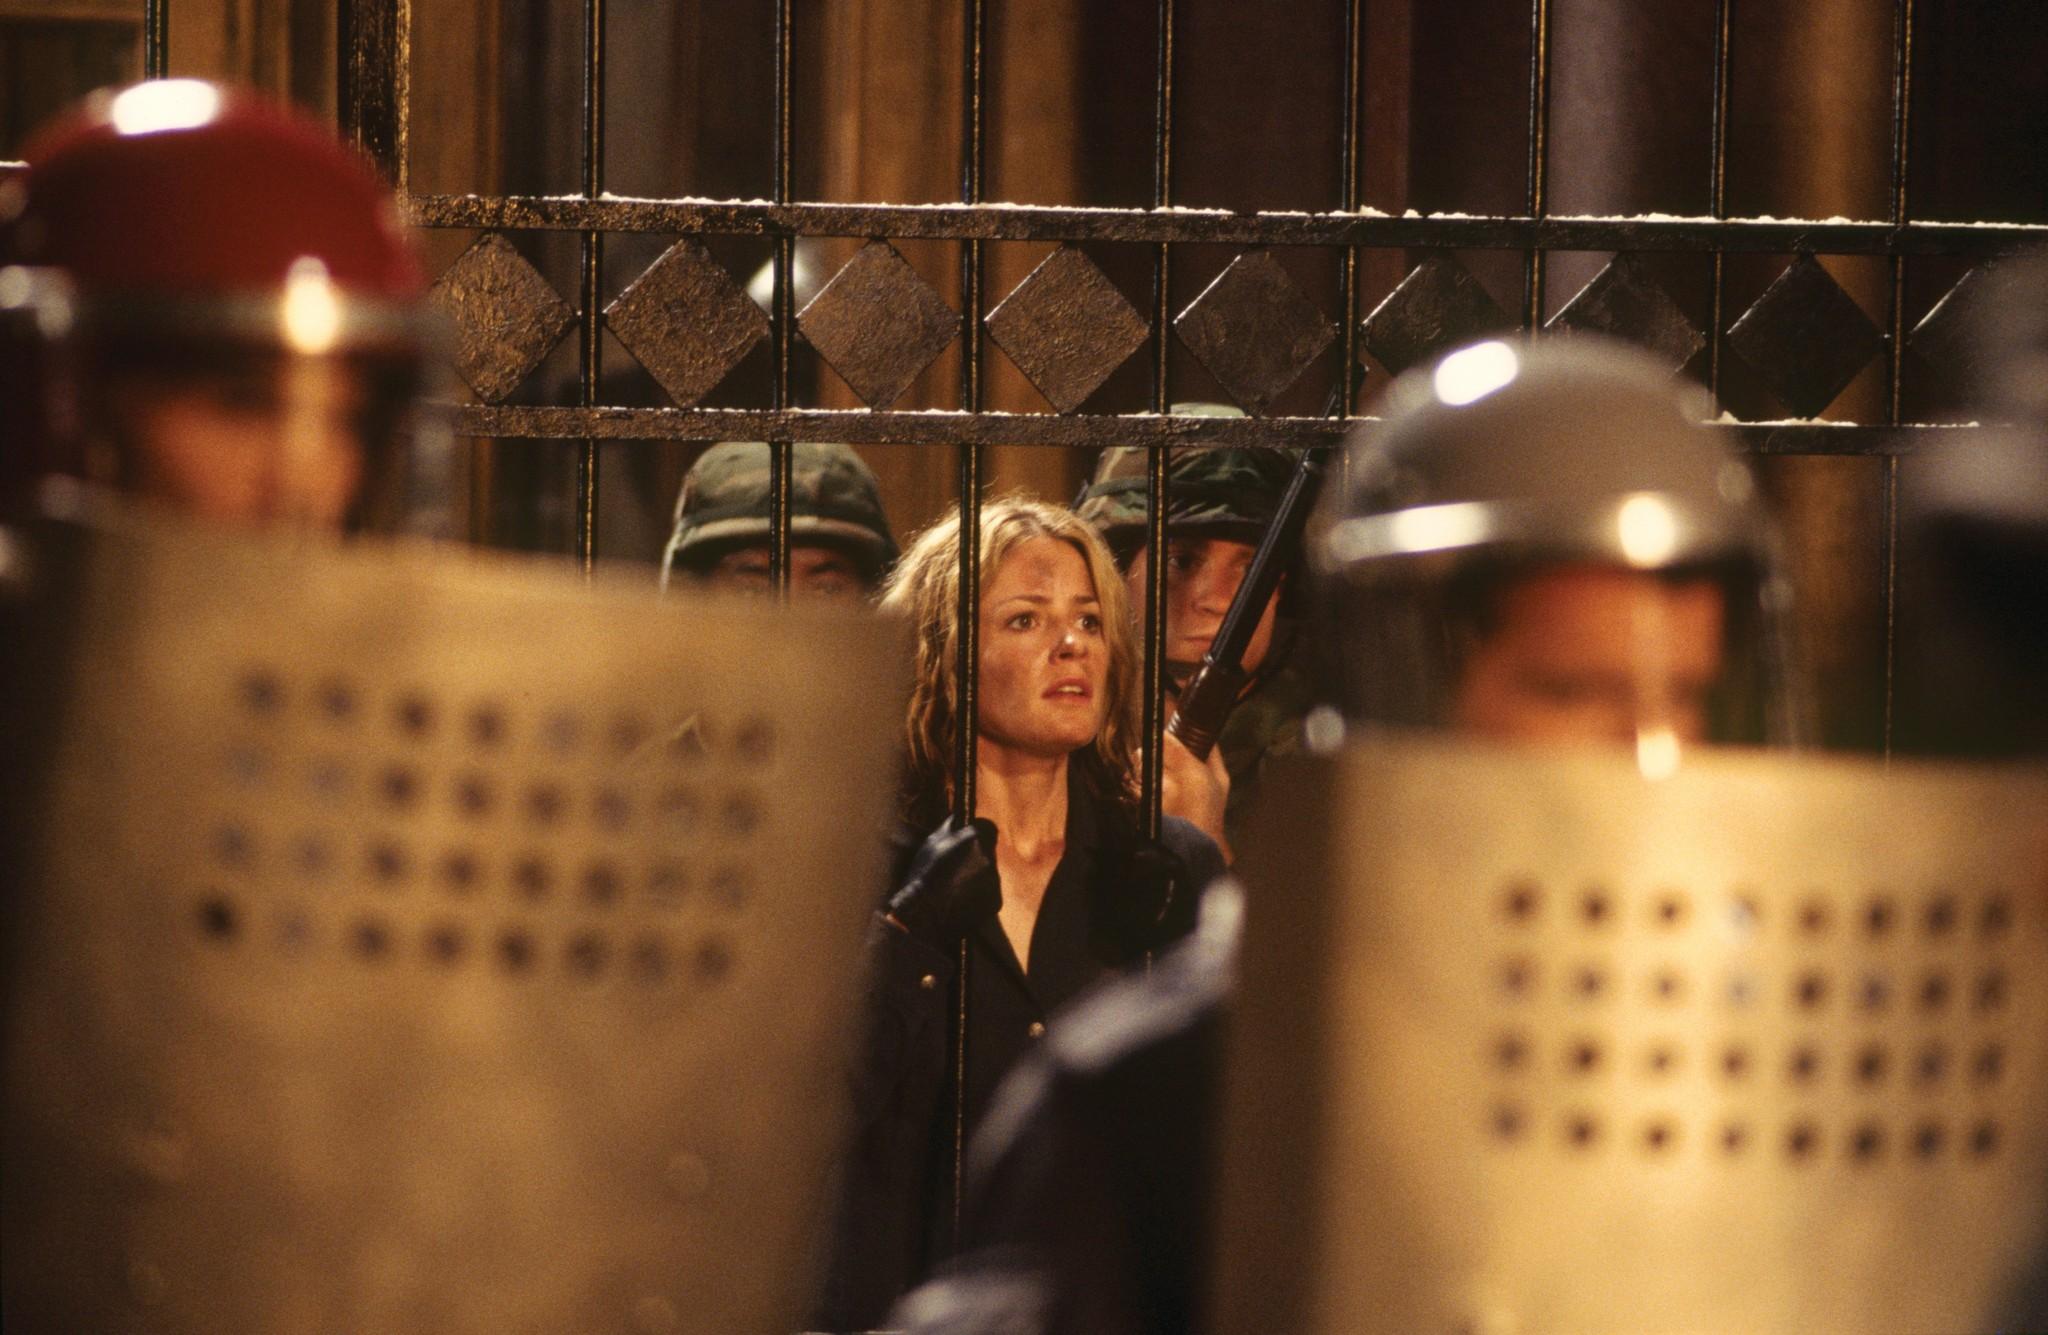 Elisabeth Shue in The Saint (1997)